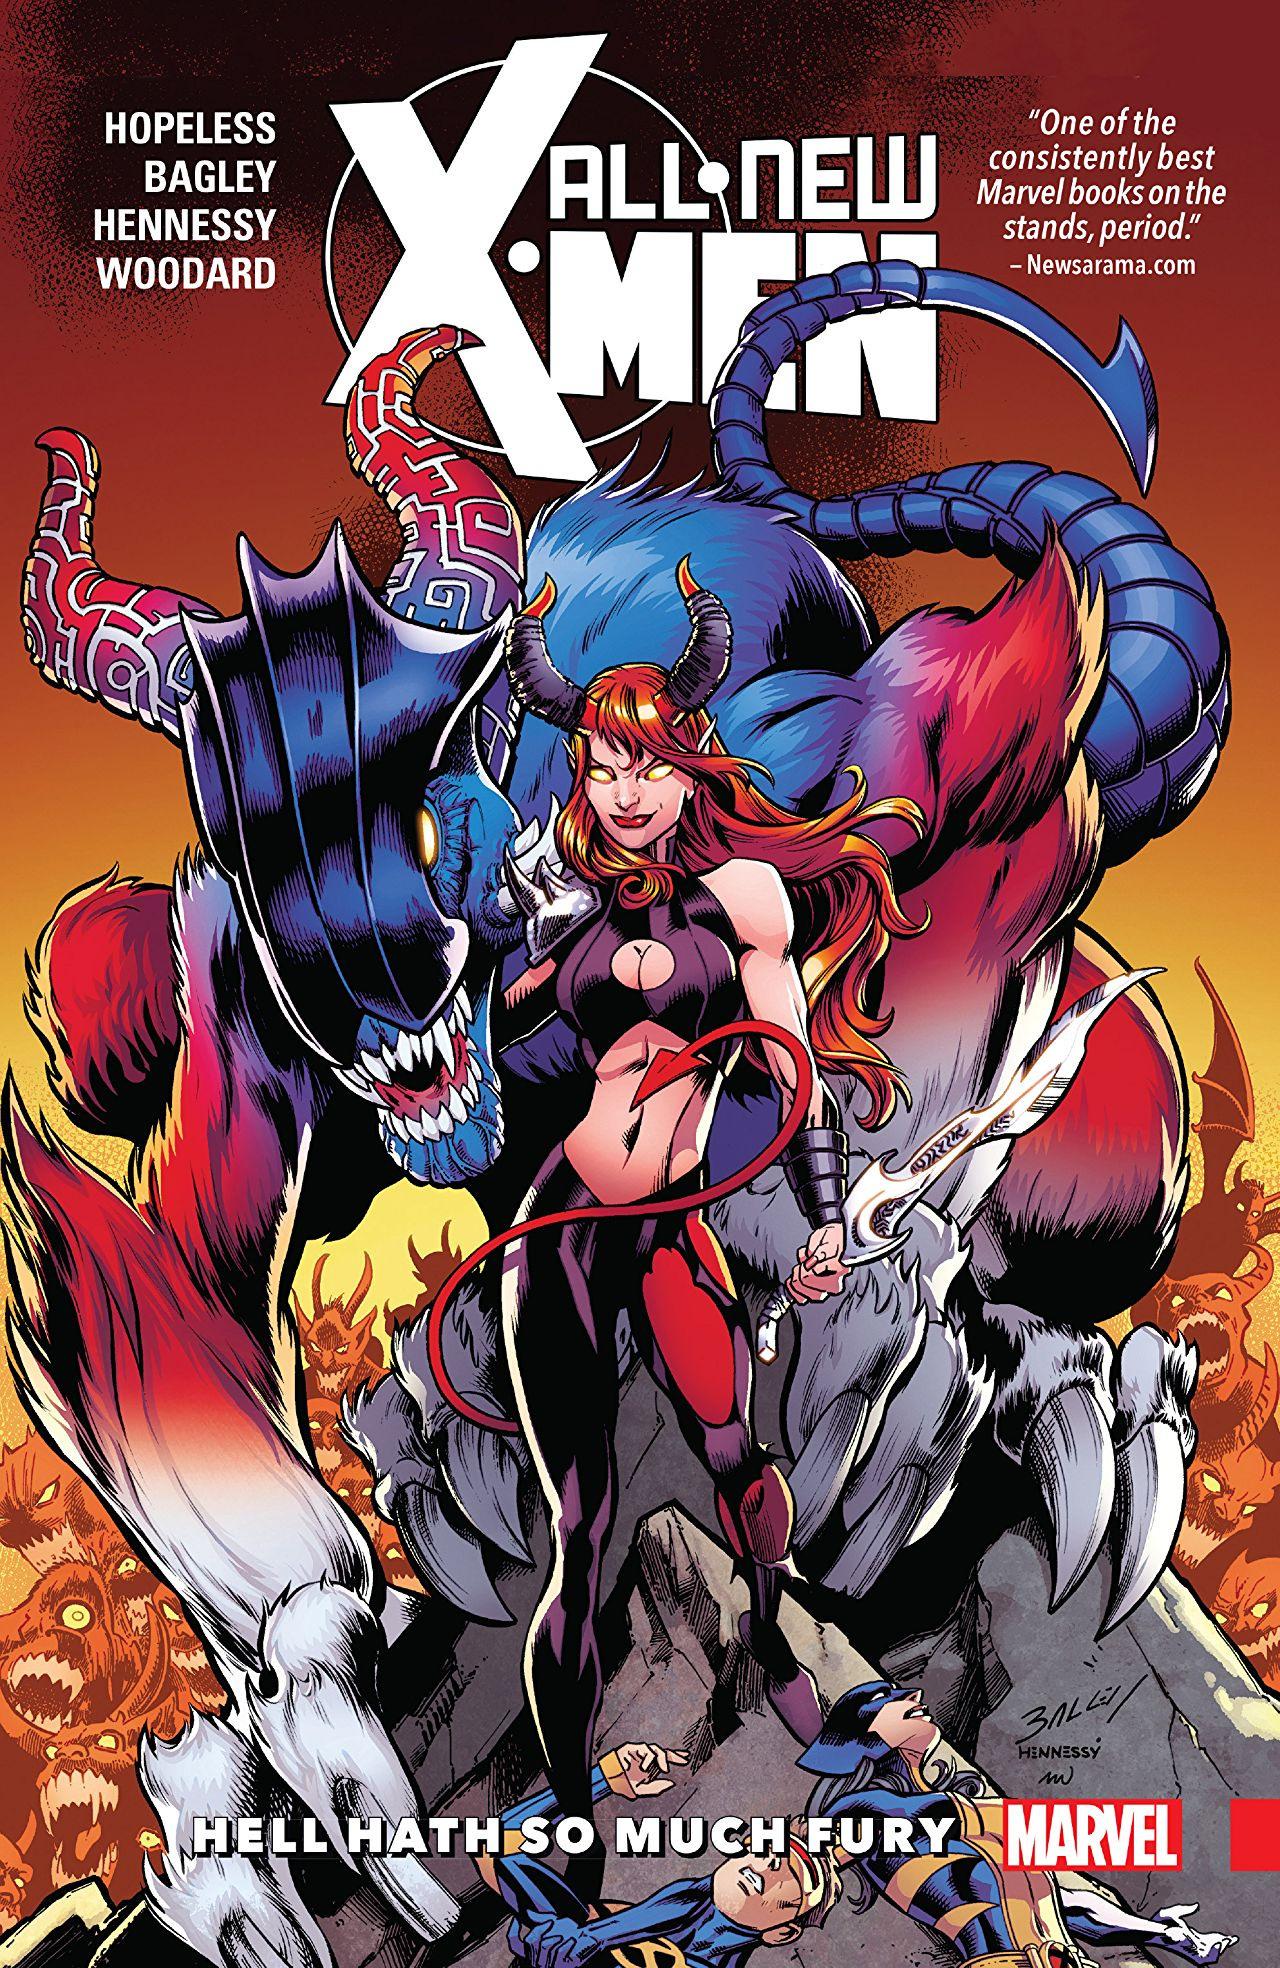 All-New X-Men: Inevitable TPB Vol 1 3: Hell Hath So Much Fury